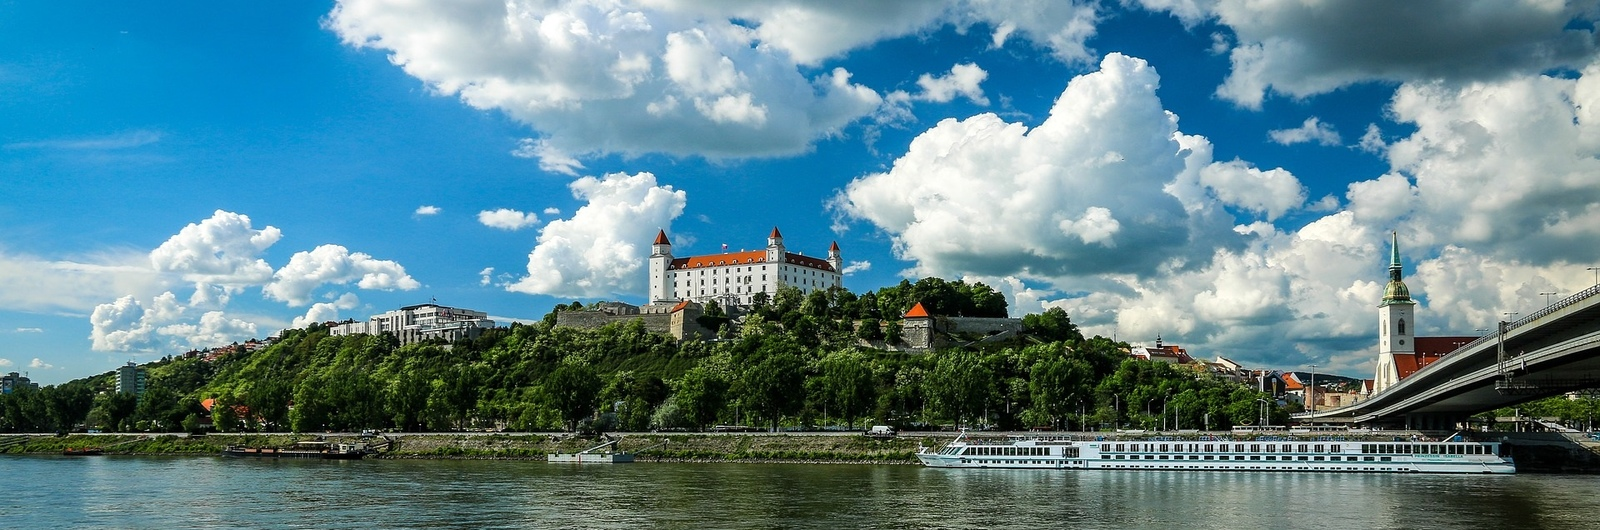 bratislava city header